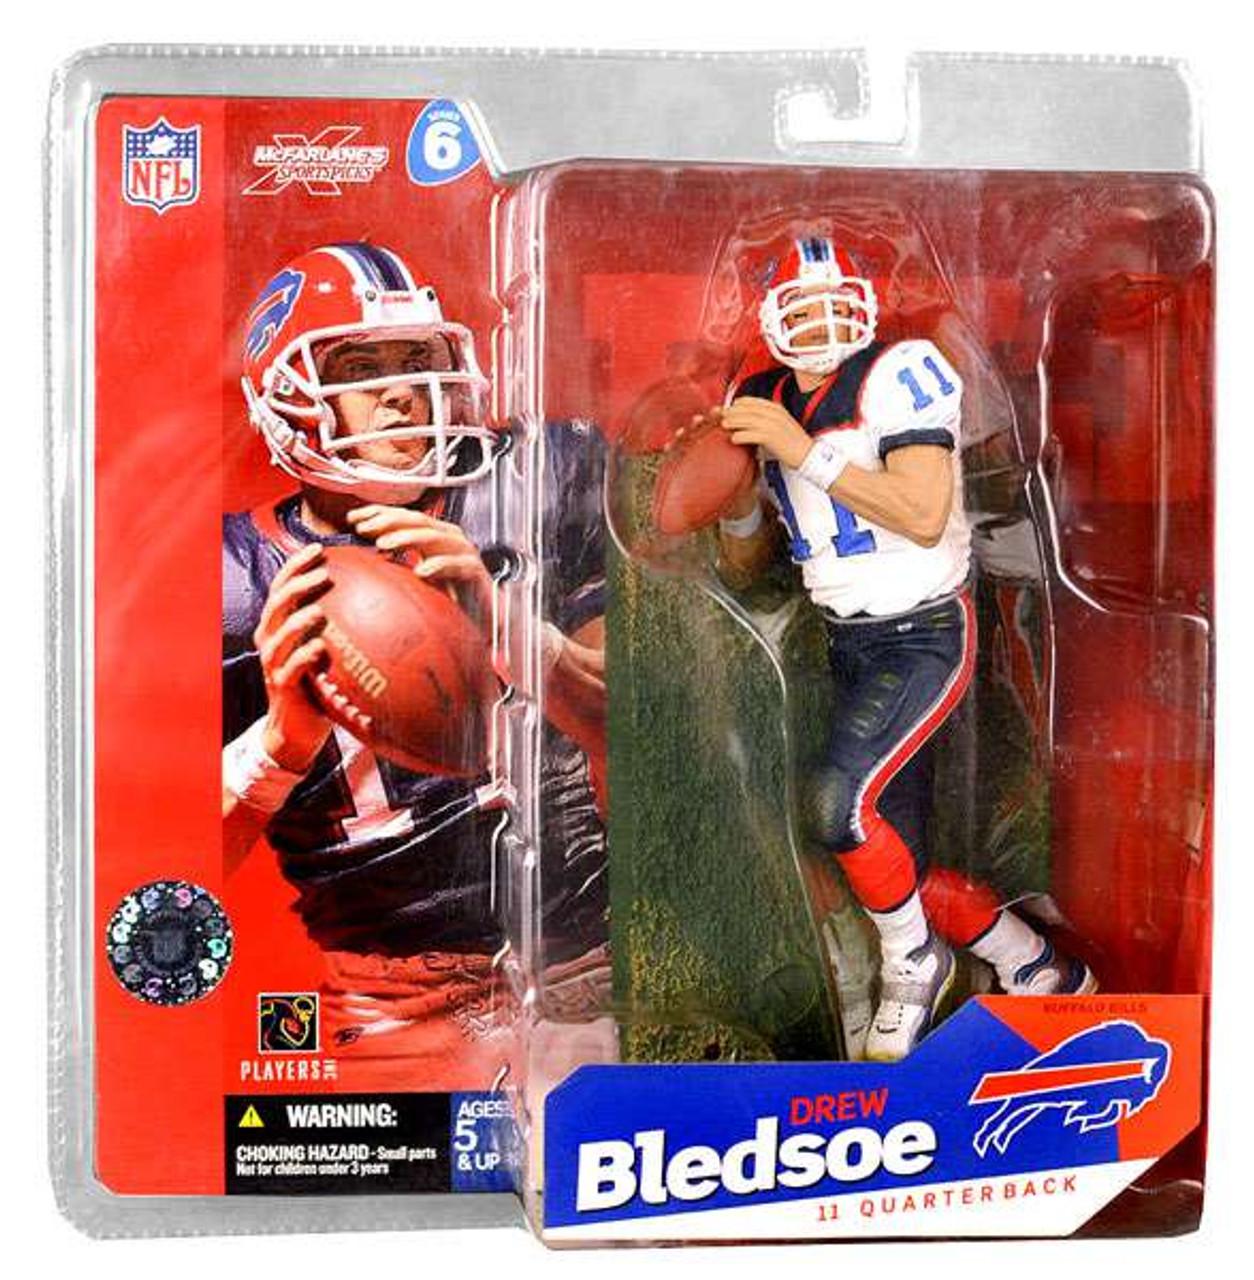 dae4c48ffdf McFarlane Toys NFL Buffalo Bills Sports Picks Series 6 Drew Bledsoe Action  Figure White Jersey Variant - ToyWiz